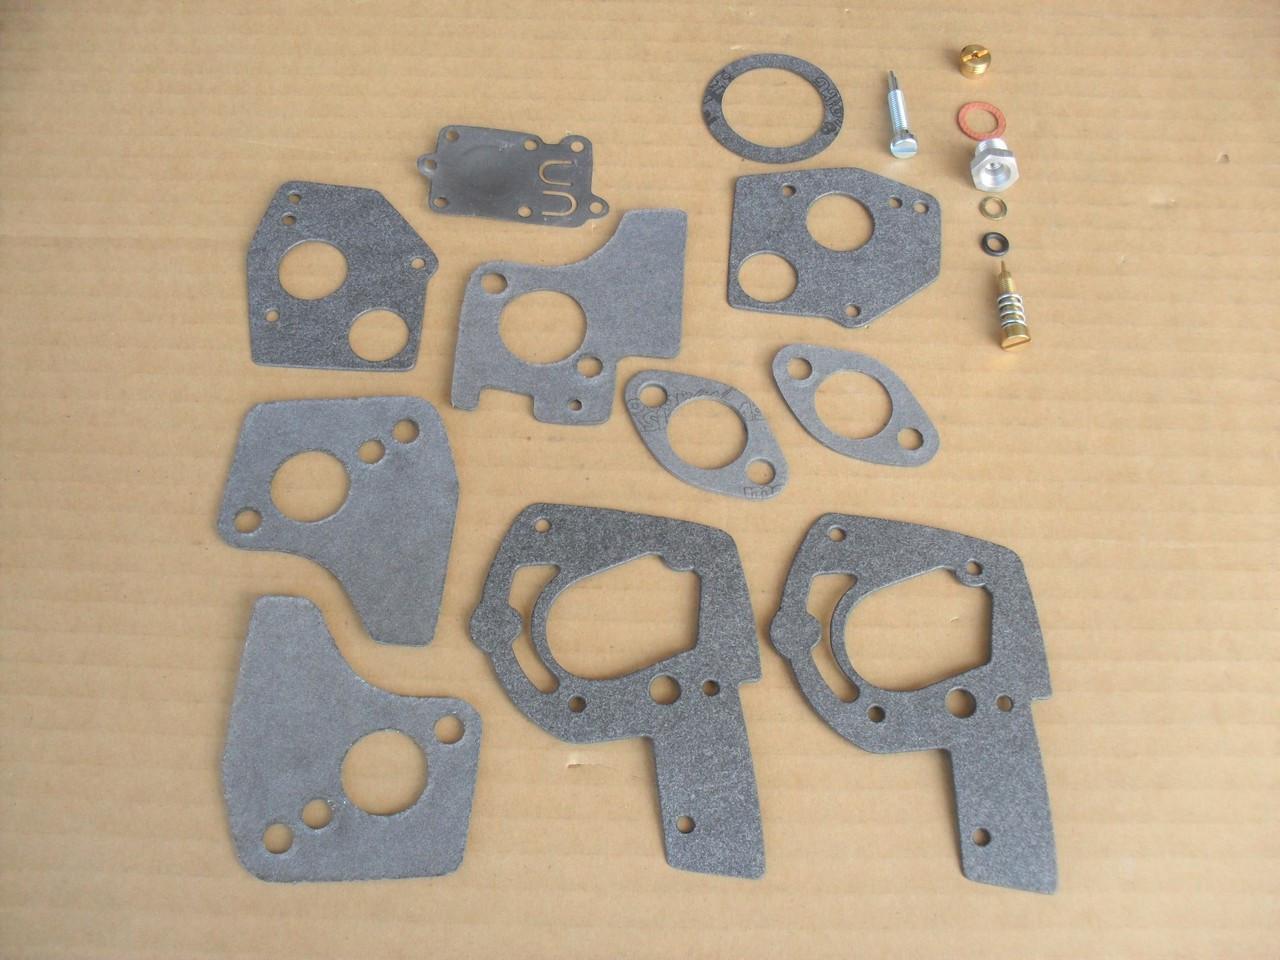 carburetor rebuild kit for briggs and stratton mclane 3 hp to 5 hp 494624  [ 1280 x 960 Pixel ]